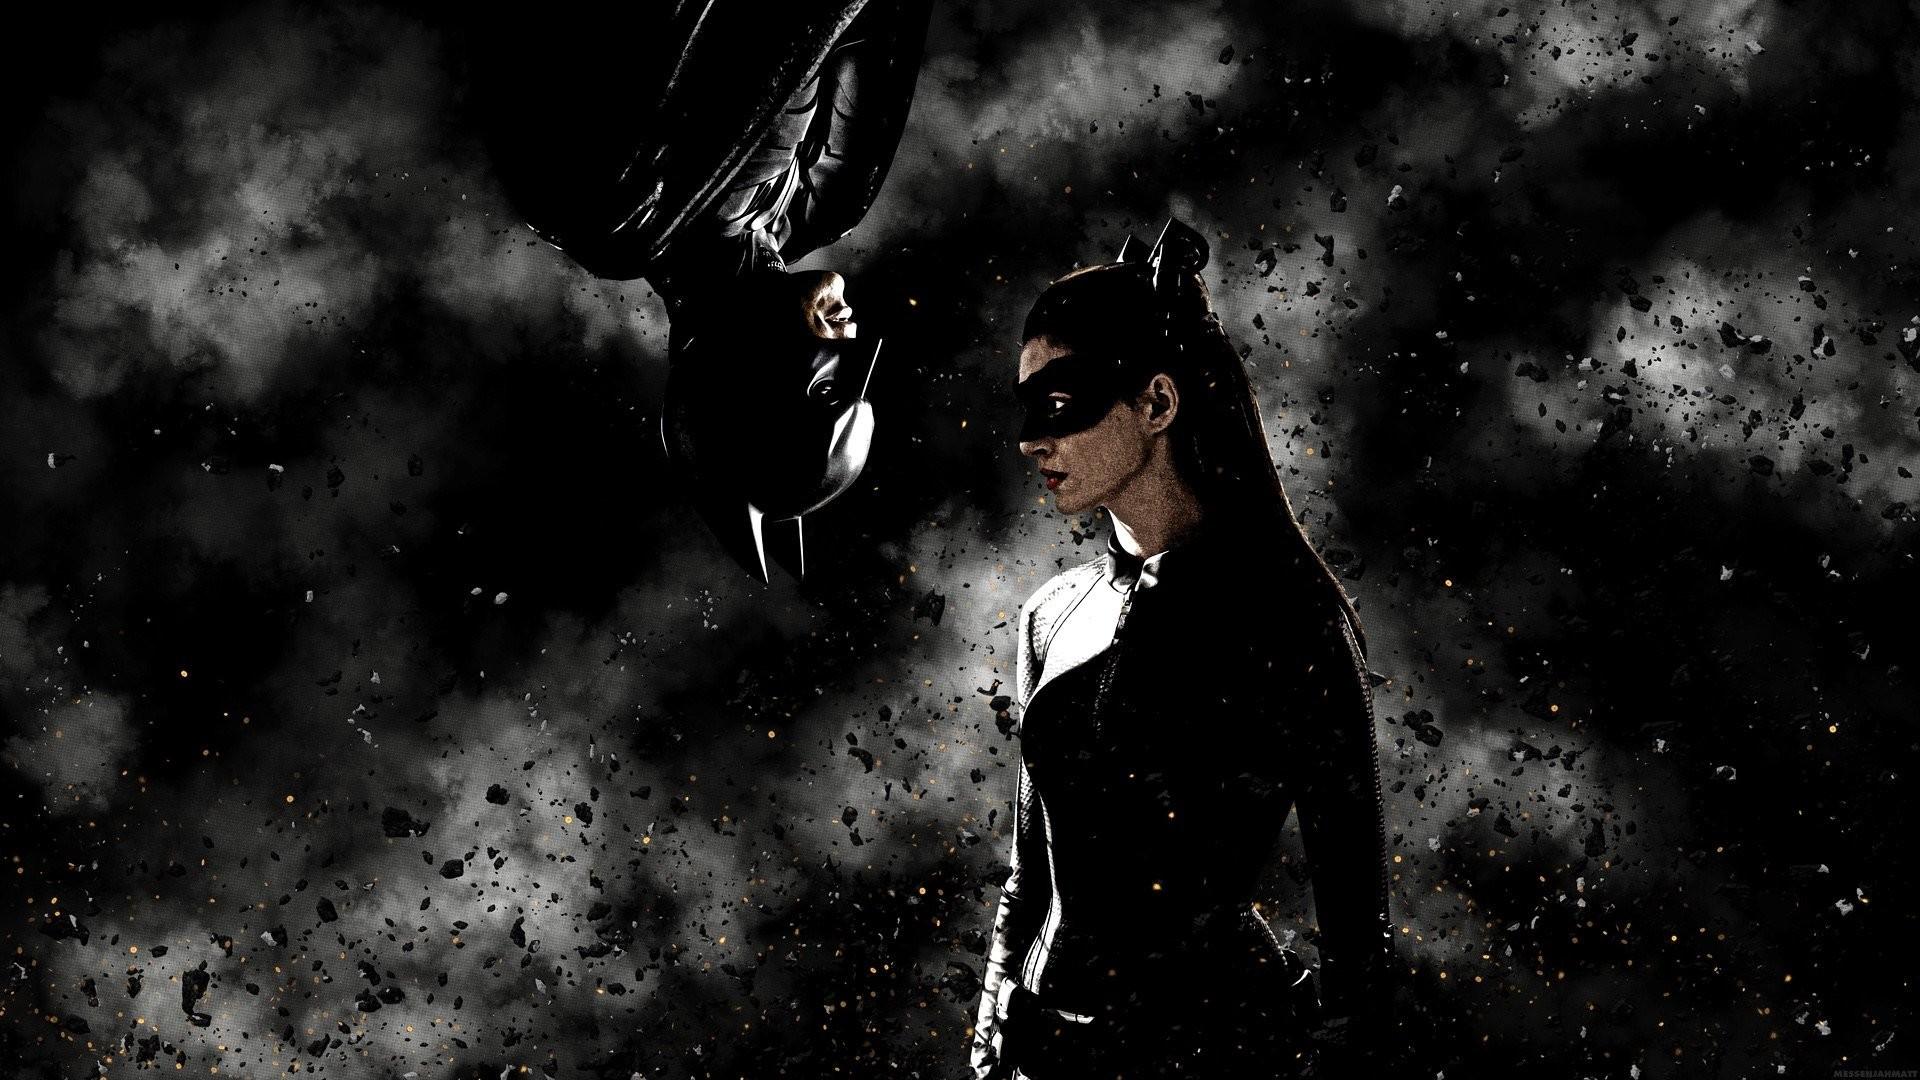 Dark Knight Wallpaper 1600×1200 The Dark Knight Wallpapers HD (55 Wallpapers)  | Adorable Wallpapers | Desktop | Pinterest | Dark knight wallpaper,  Wallpaper …